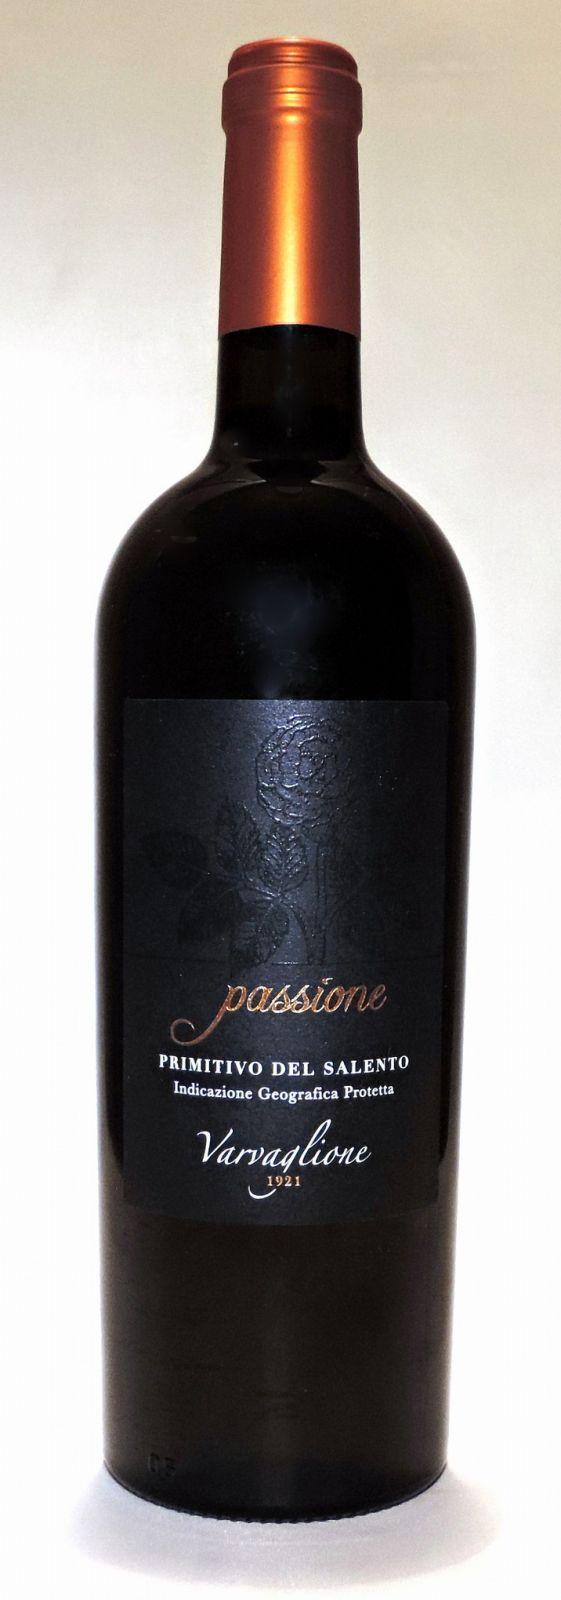 Passione - Primitivo del Salento IGP, 2017, 0,75 l - vinařství Varvaglione